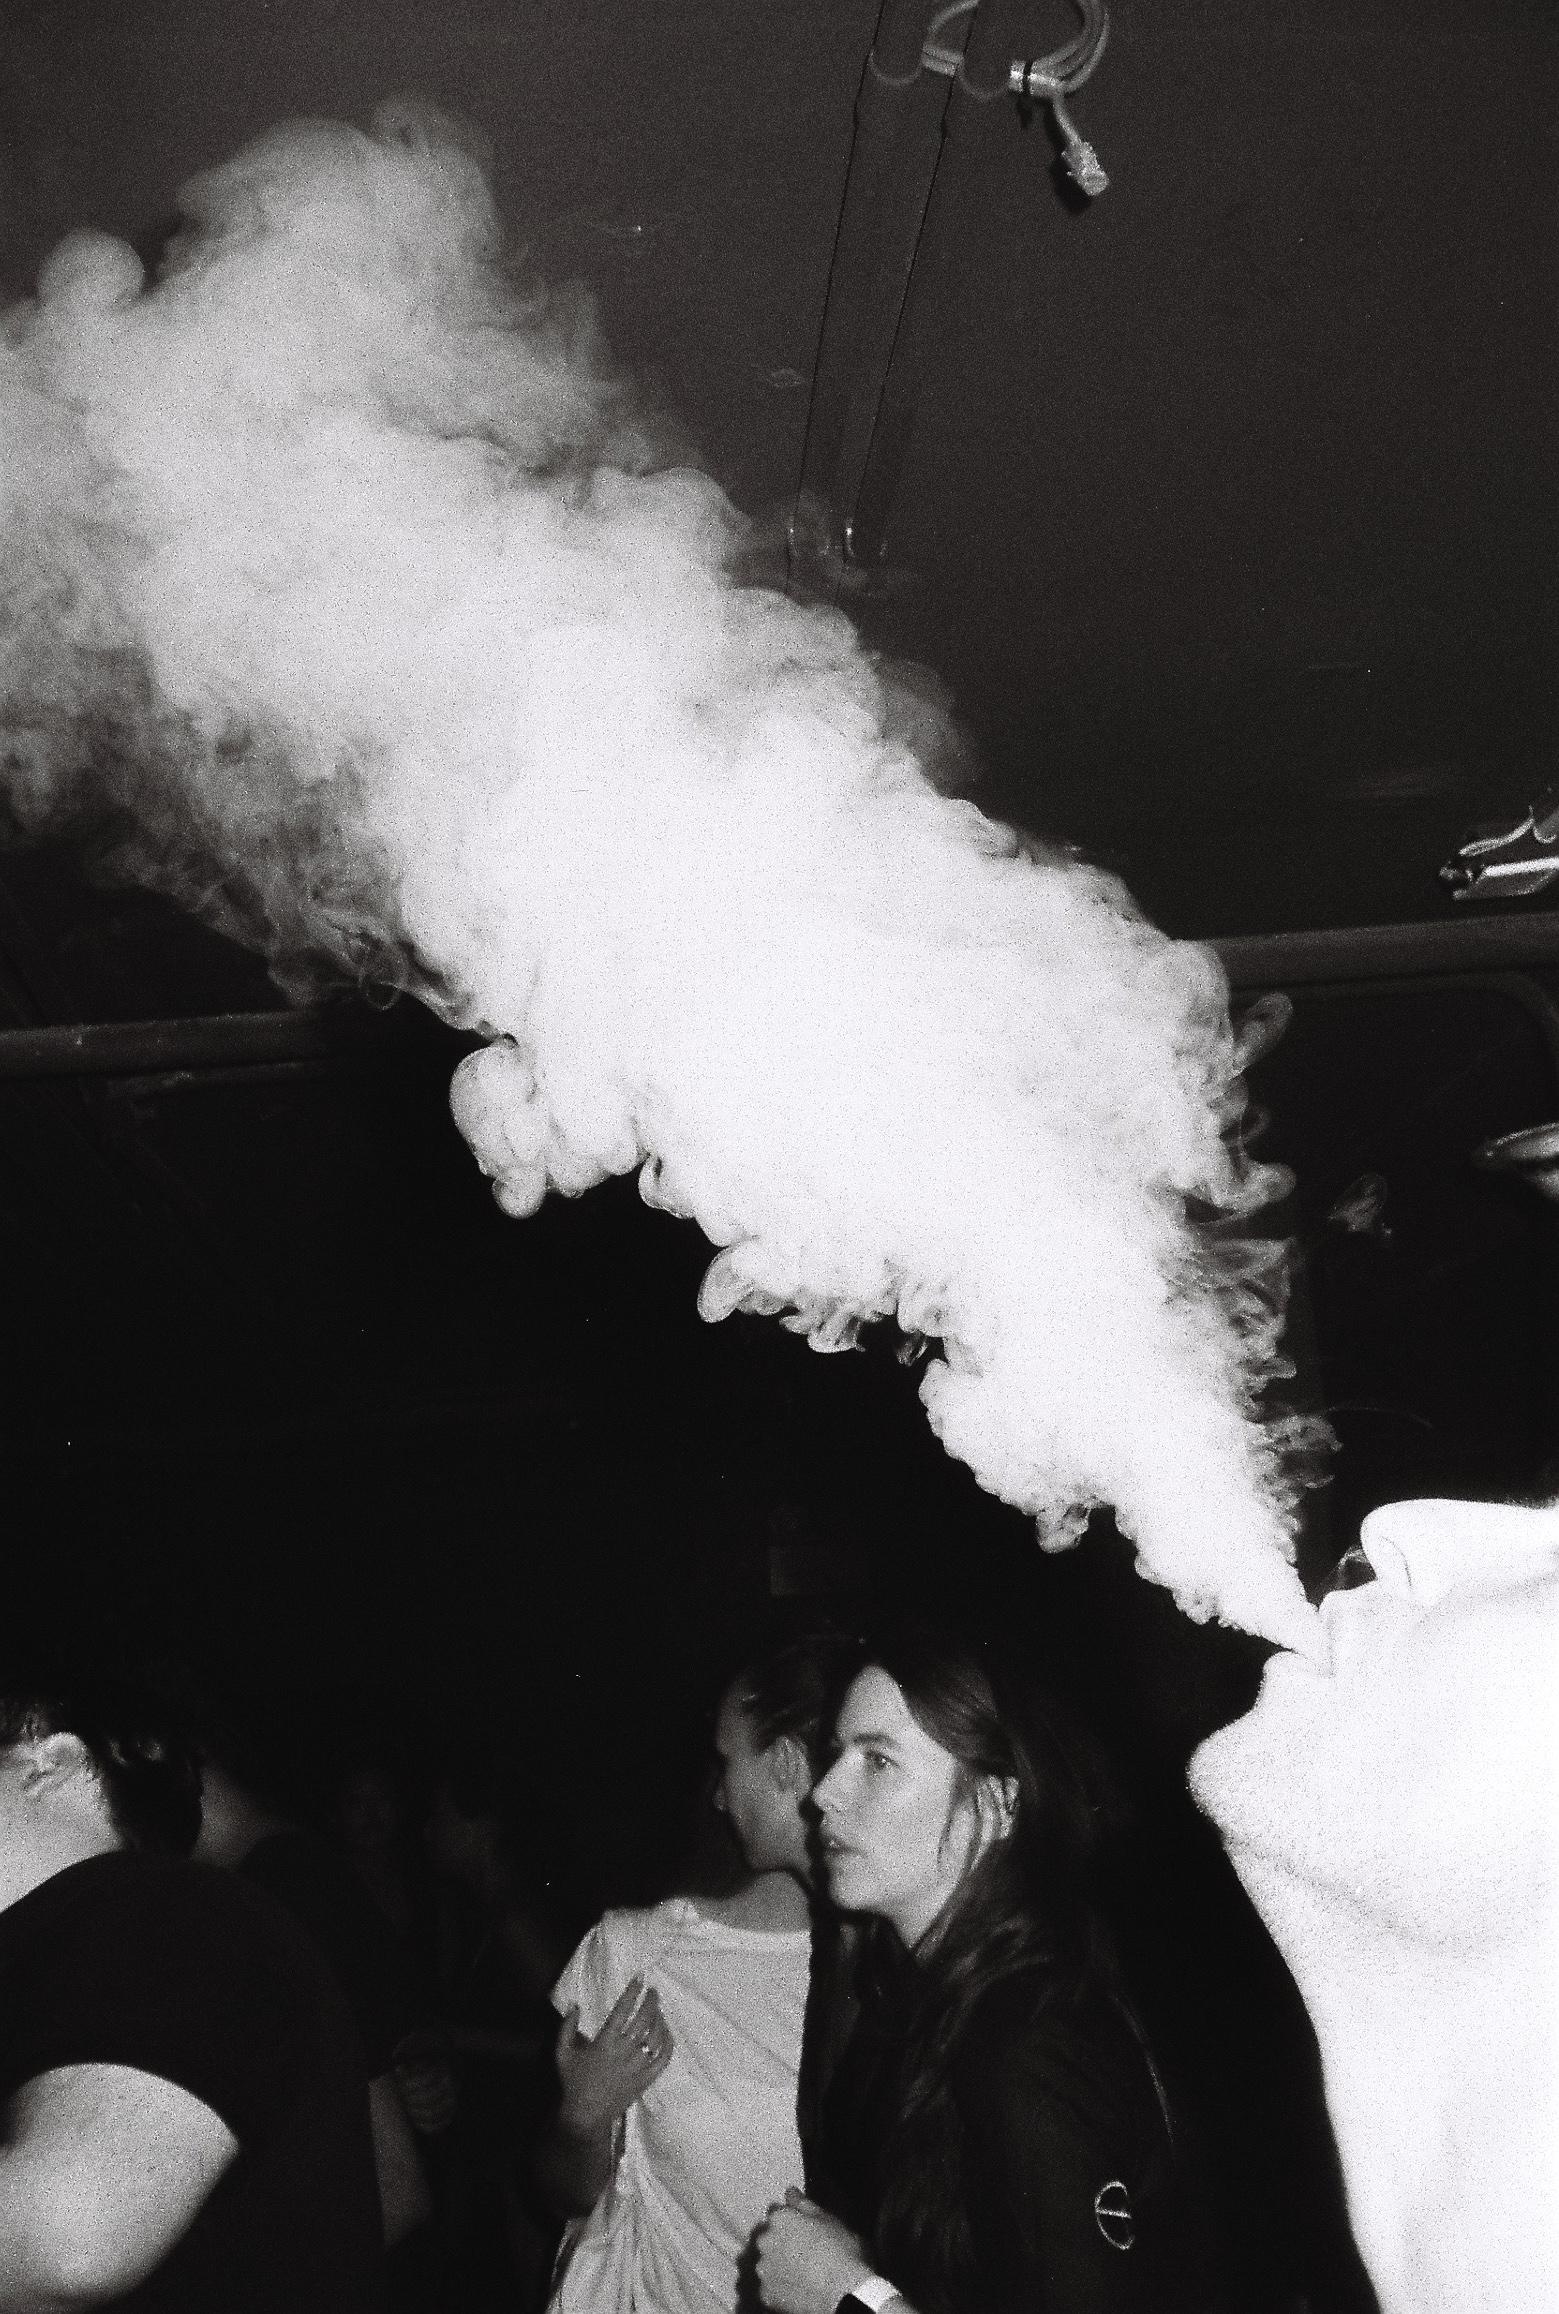 gabriel-gauffre-photography-of-china-4.jpg